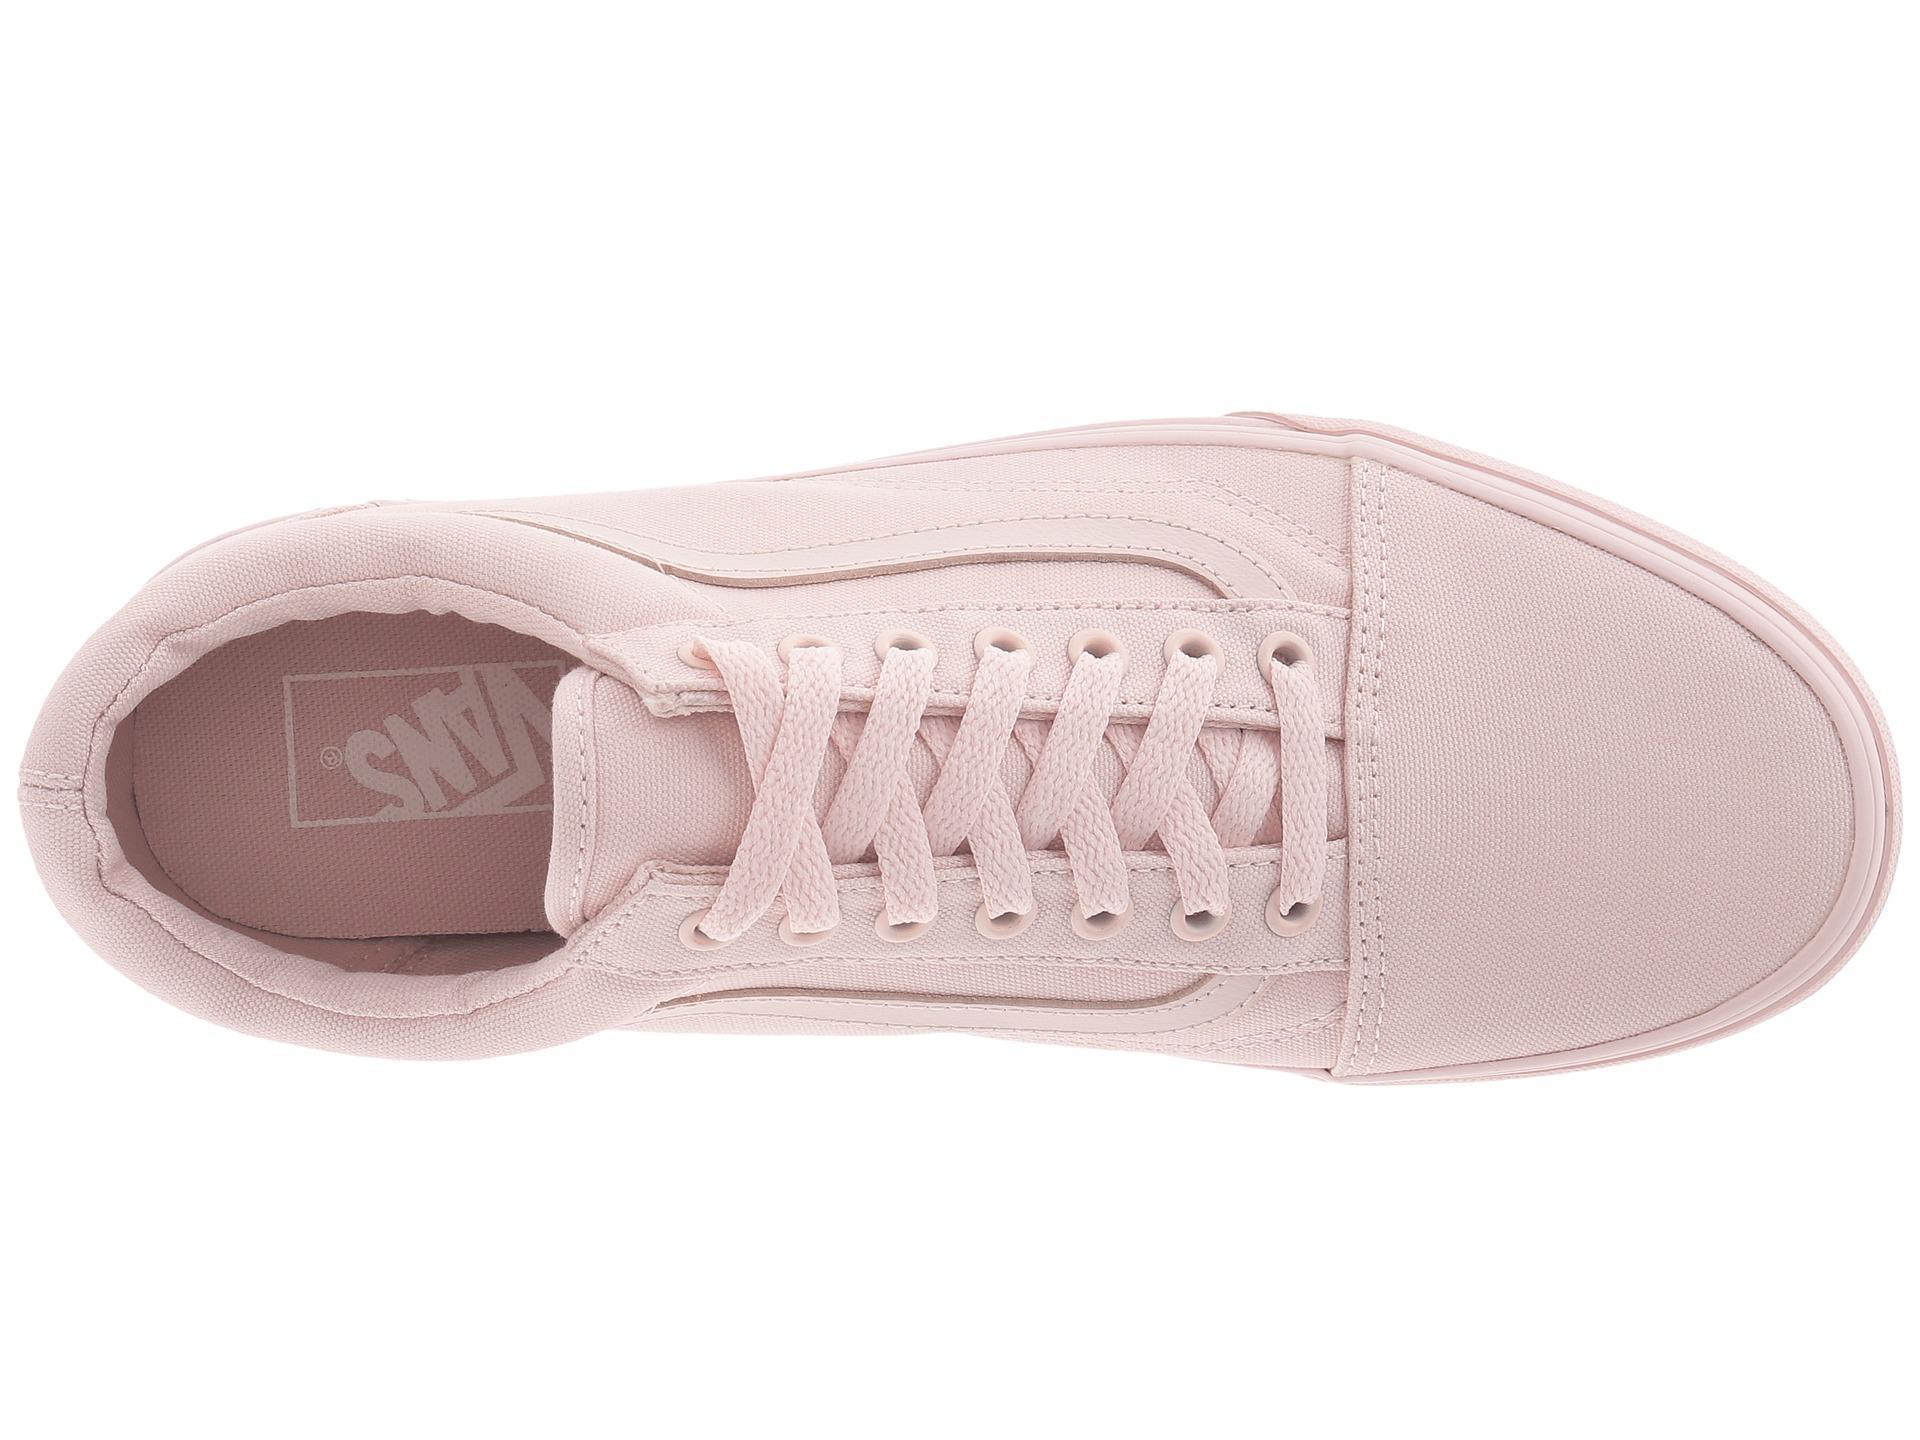 a1b5e8265276e2 Lyst - Vans Old Skool™ Sneakers in Pink